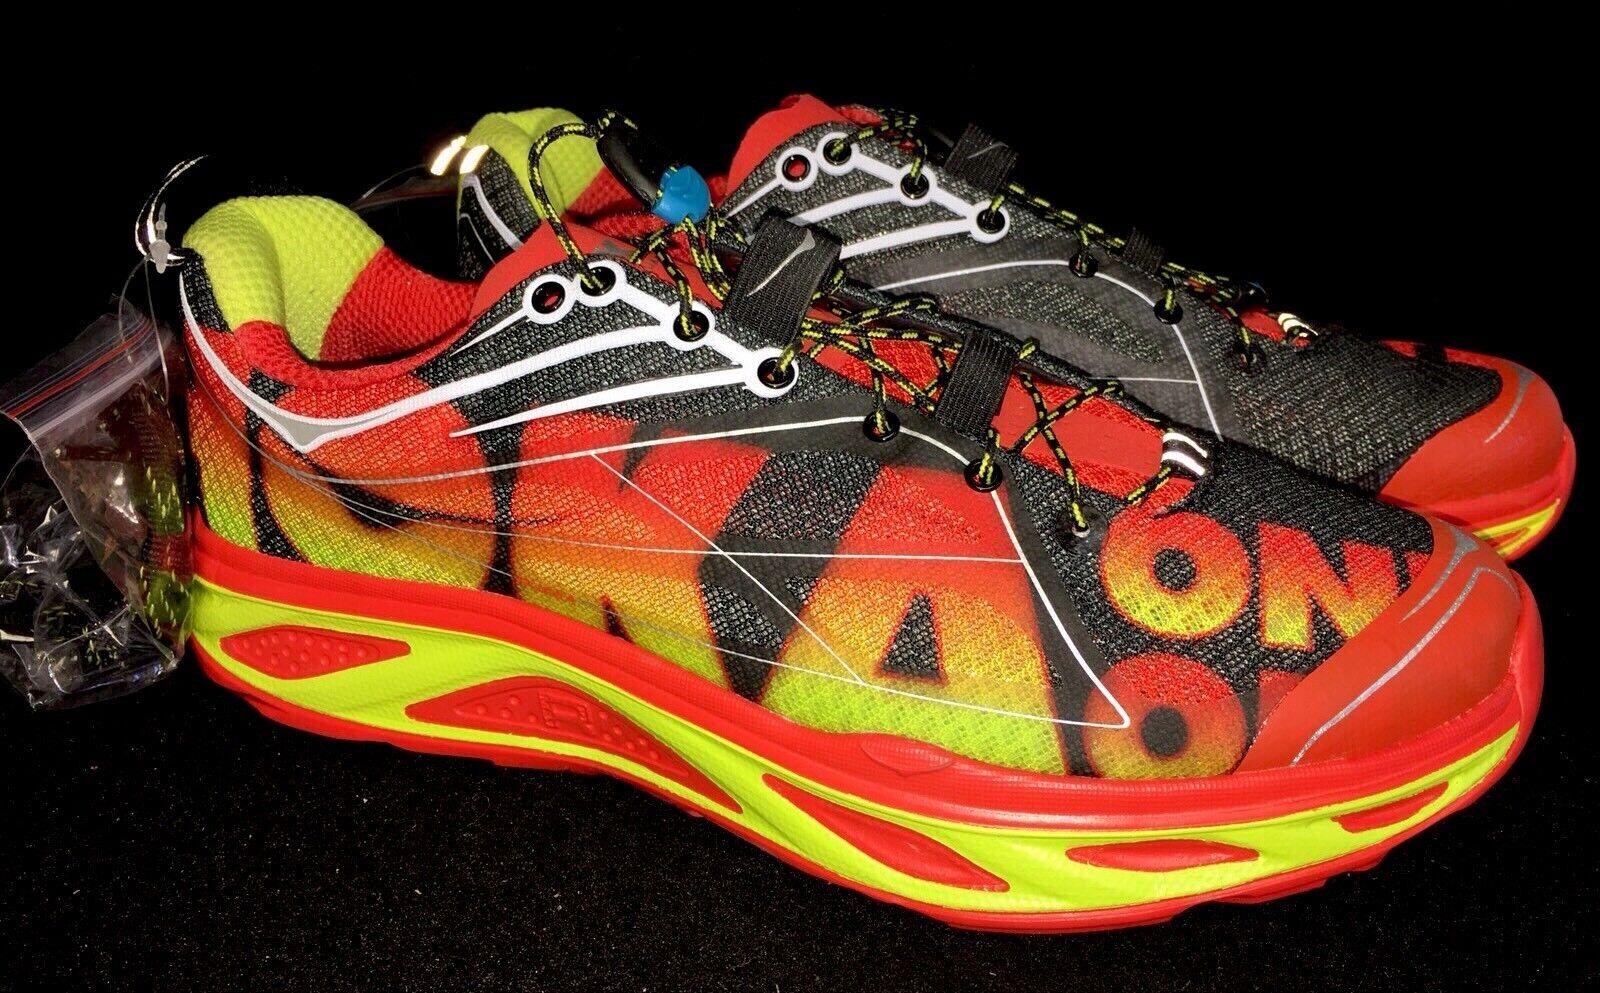 Hoka huaka Naranja Flash One One ácido Para hombres Zapatos para Correr Tenis